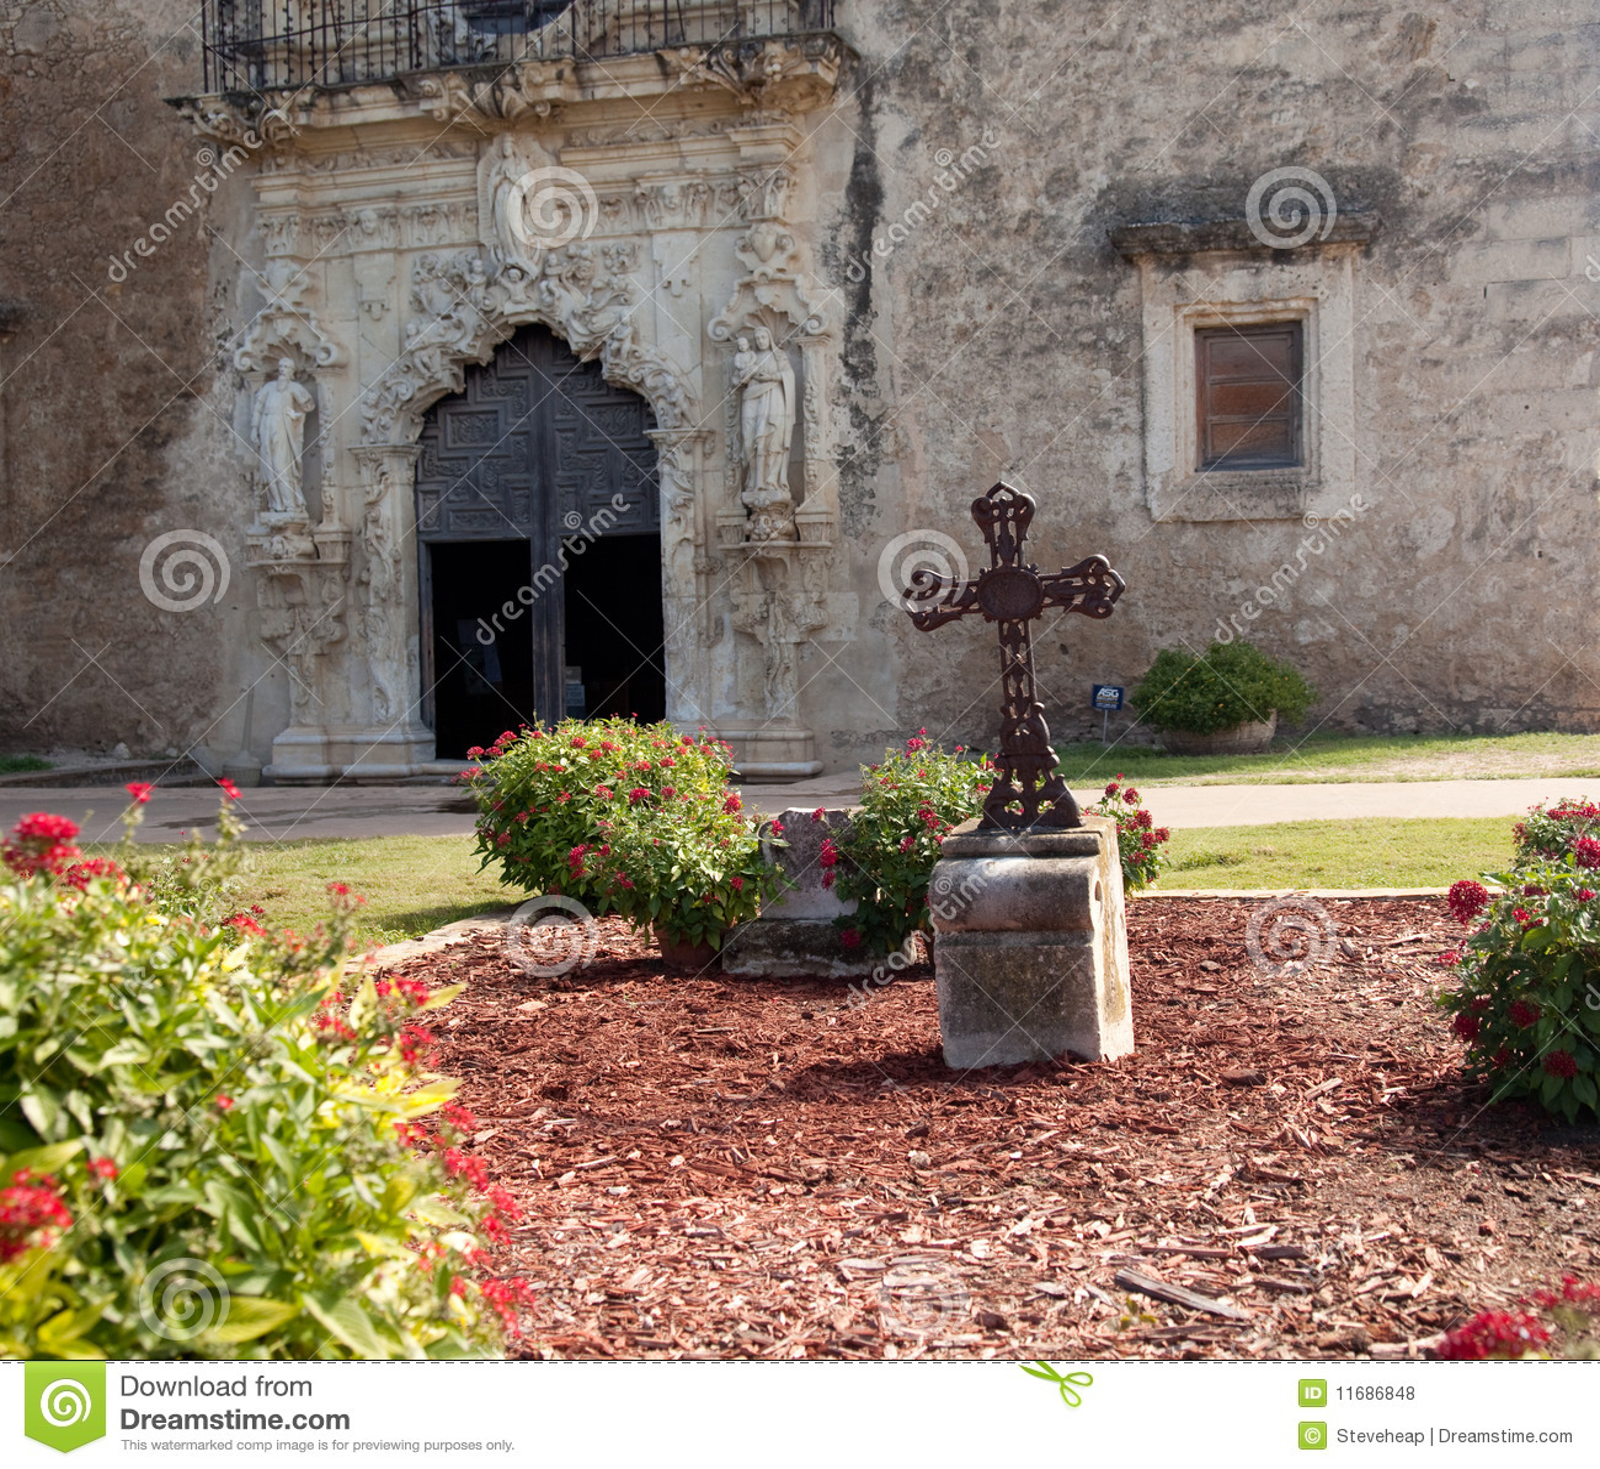 Download San Antonio Mission San Juan In Texas Stock Photo - Image of tourism, blue: 11686848